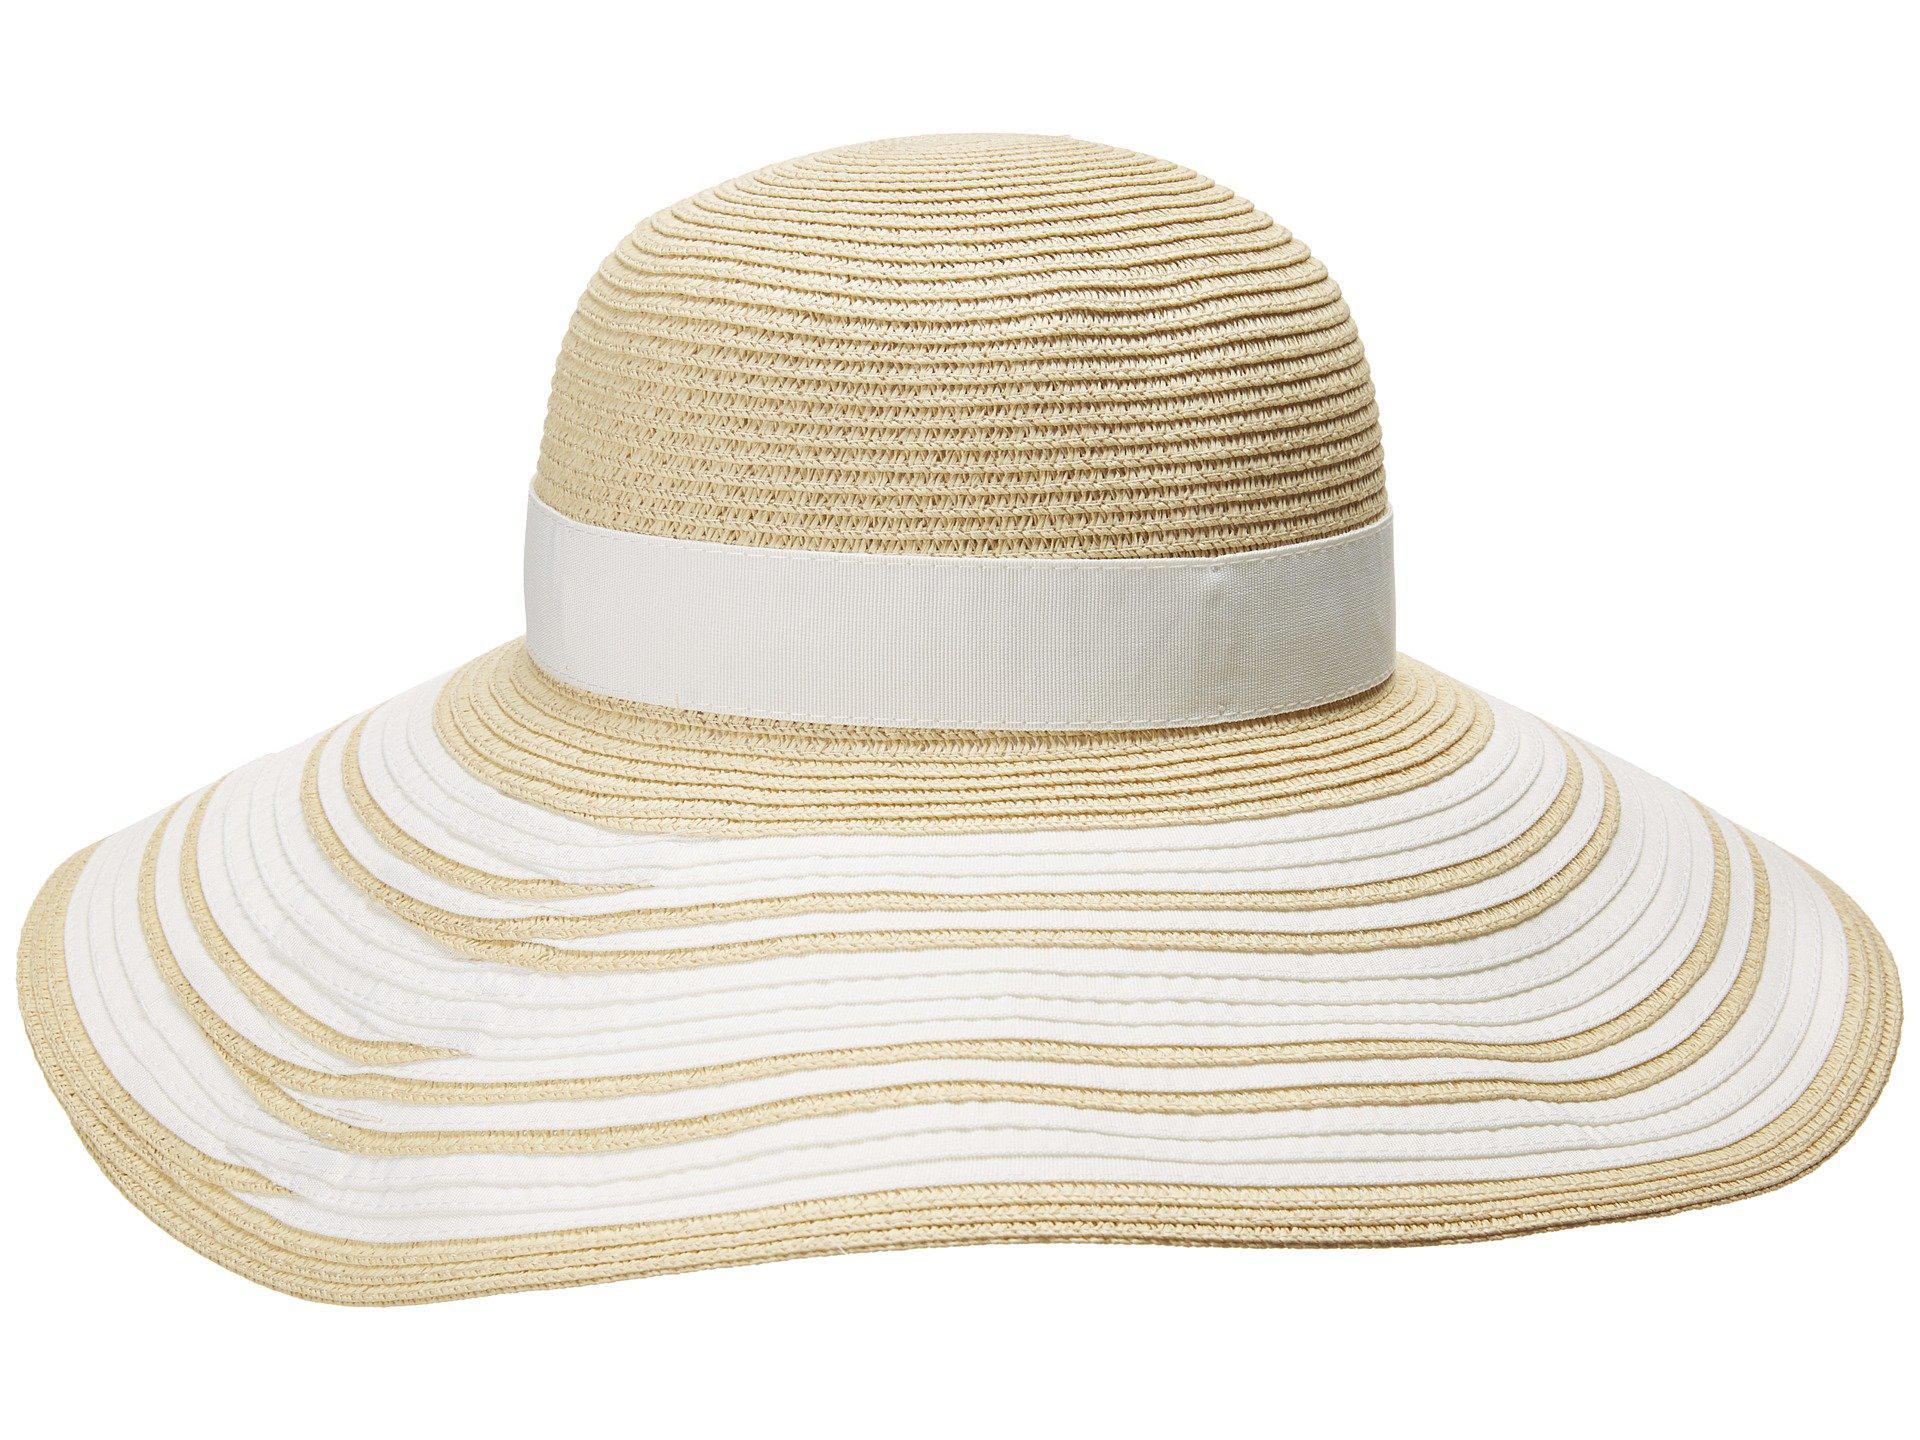 Lauren by Ralph Lauren - Packable Signature Grosgrain Sun Hat (natural cream)  Caps. View fullscreen 4486b9dce553